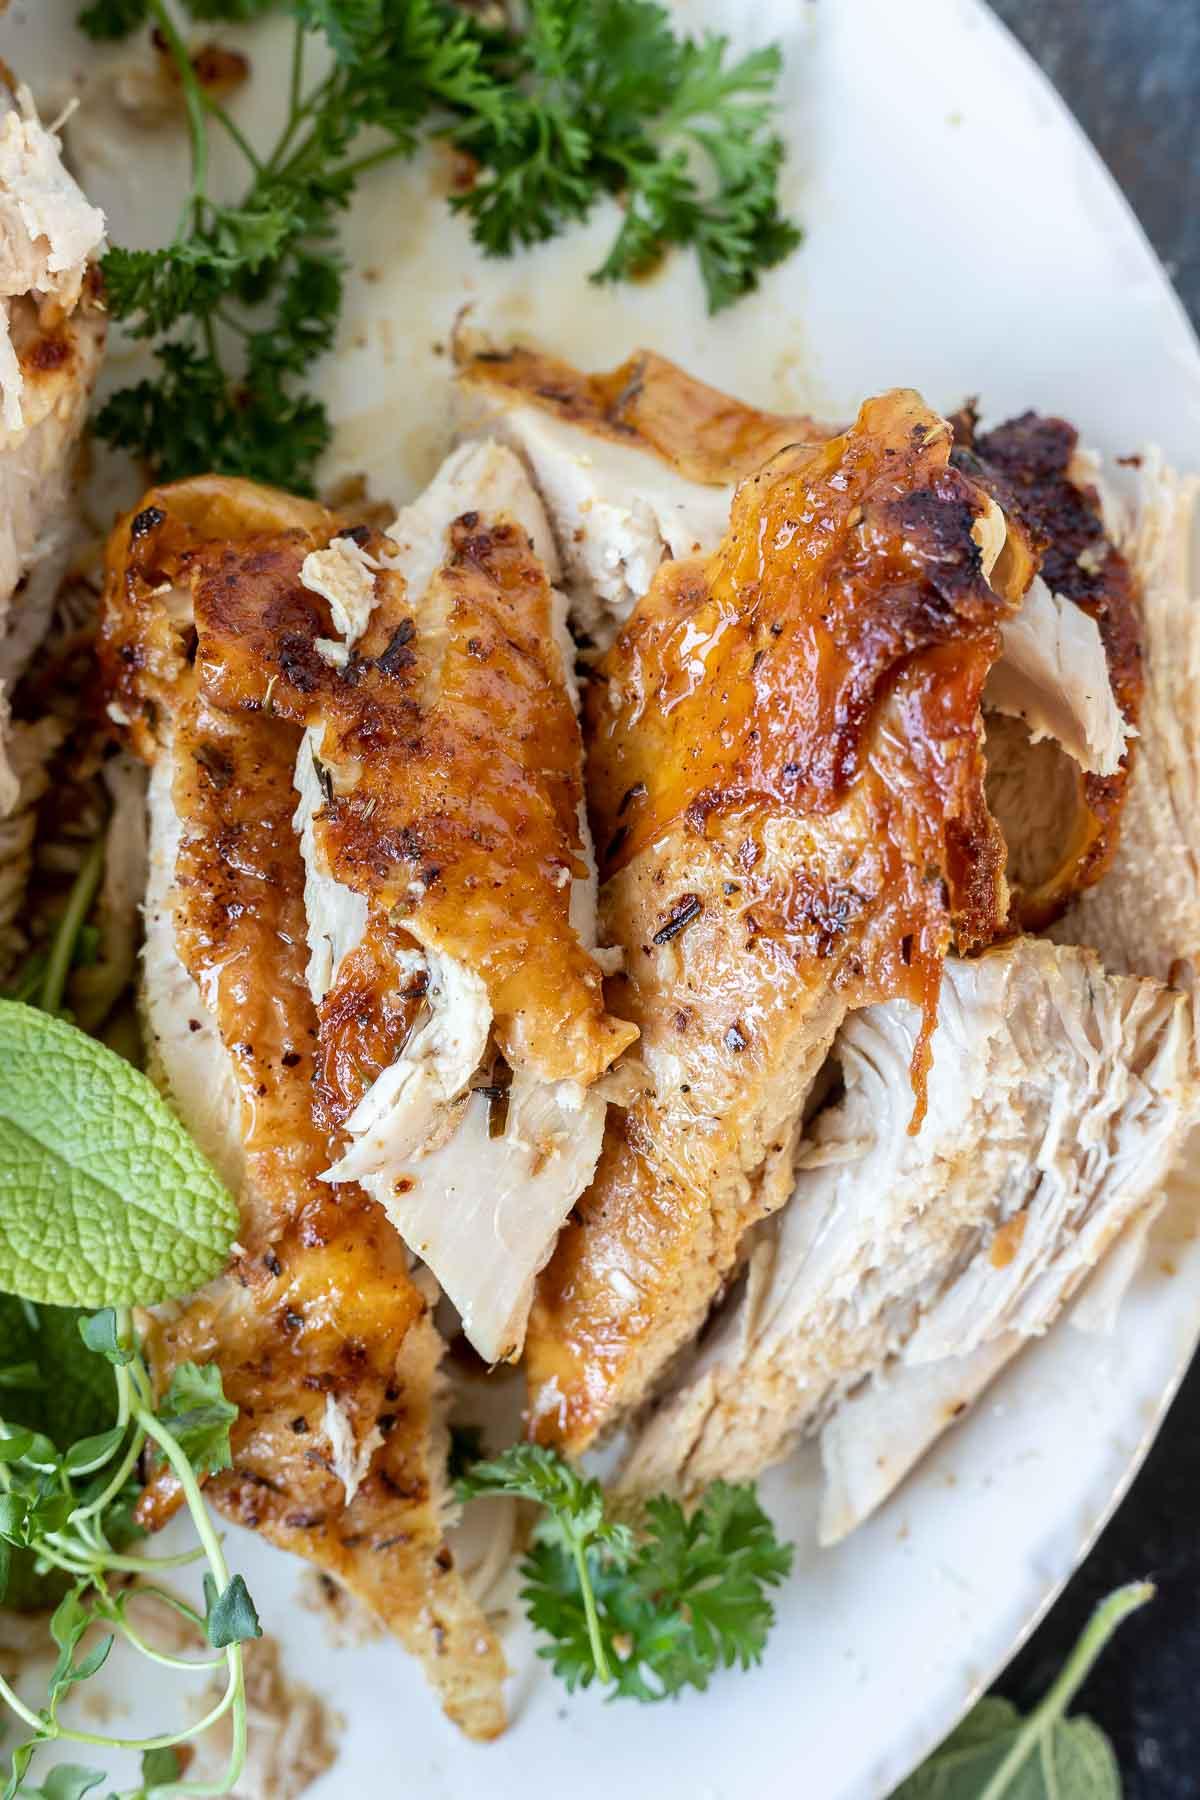 slices of turkey breast on white platter